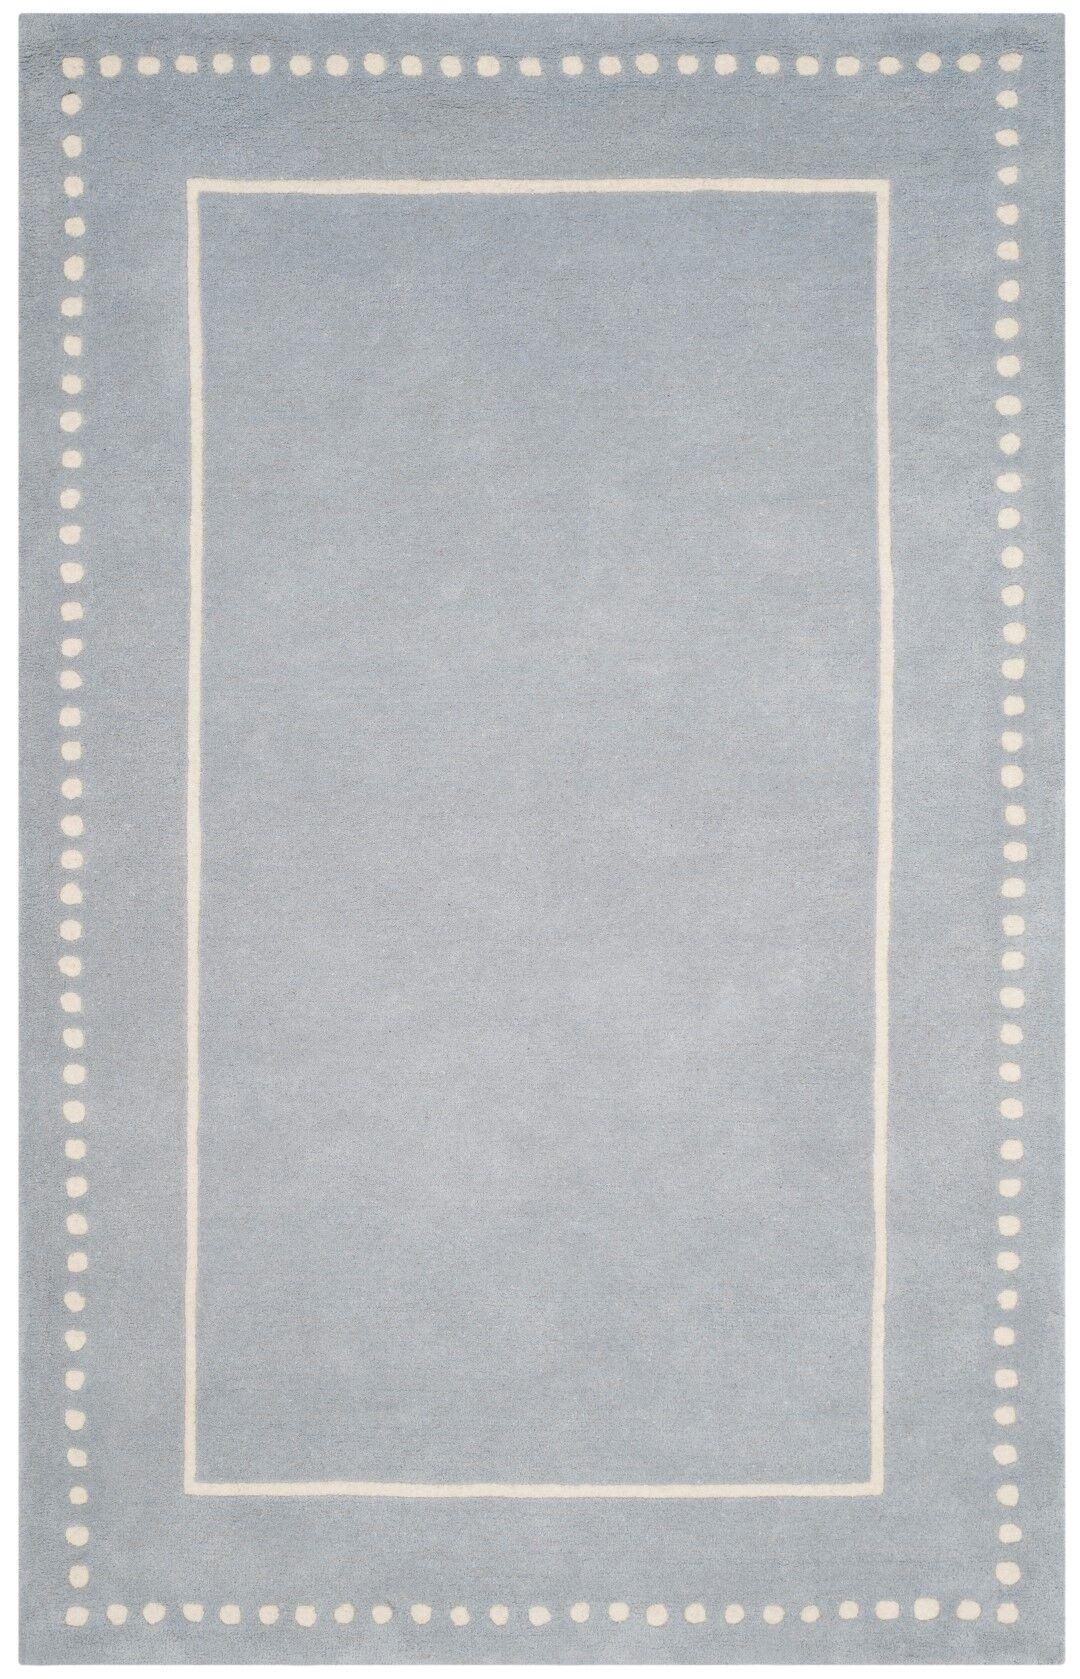 Amundson Hand-Tufted Light Blue/Ivory Area Rug Rug Size: Rectangle 4' x 6'